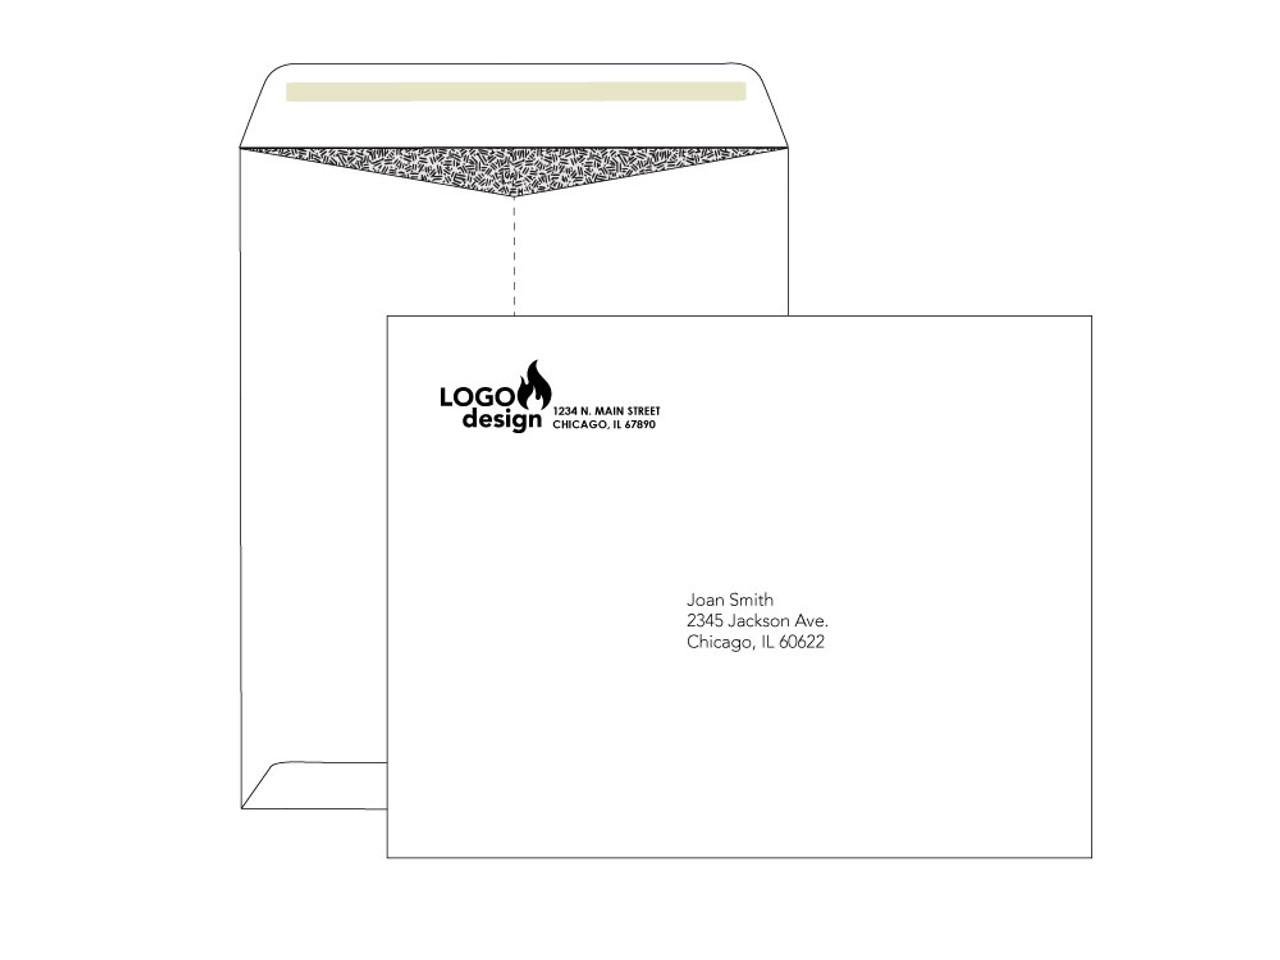 Custom 10x13 Security Envelopes - EN1014